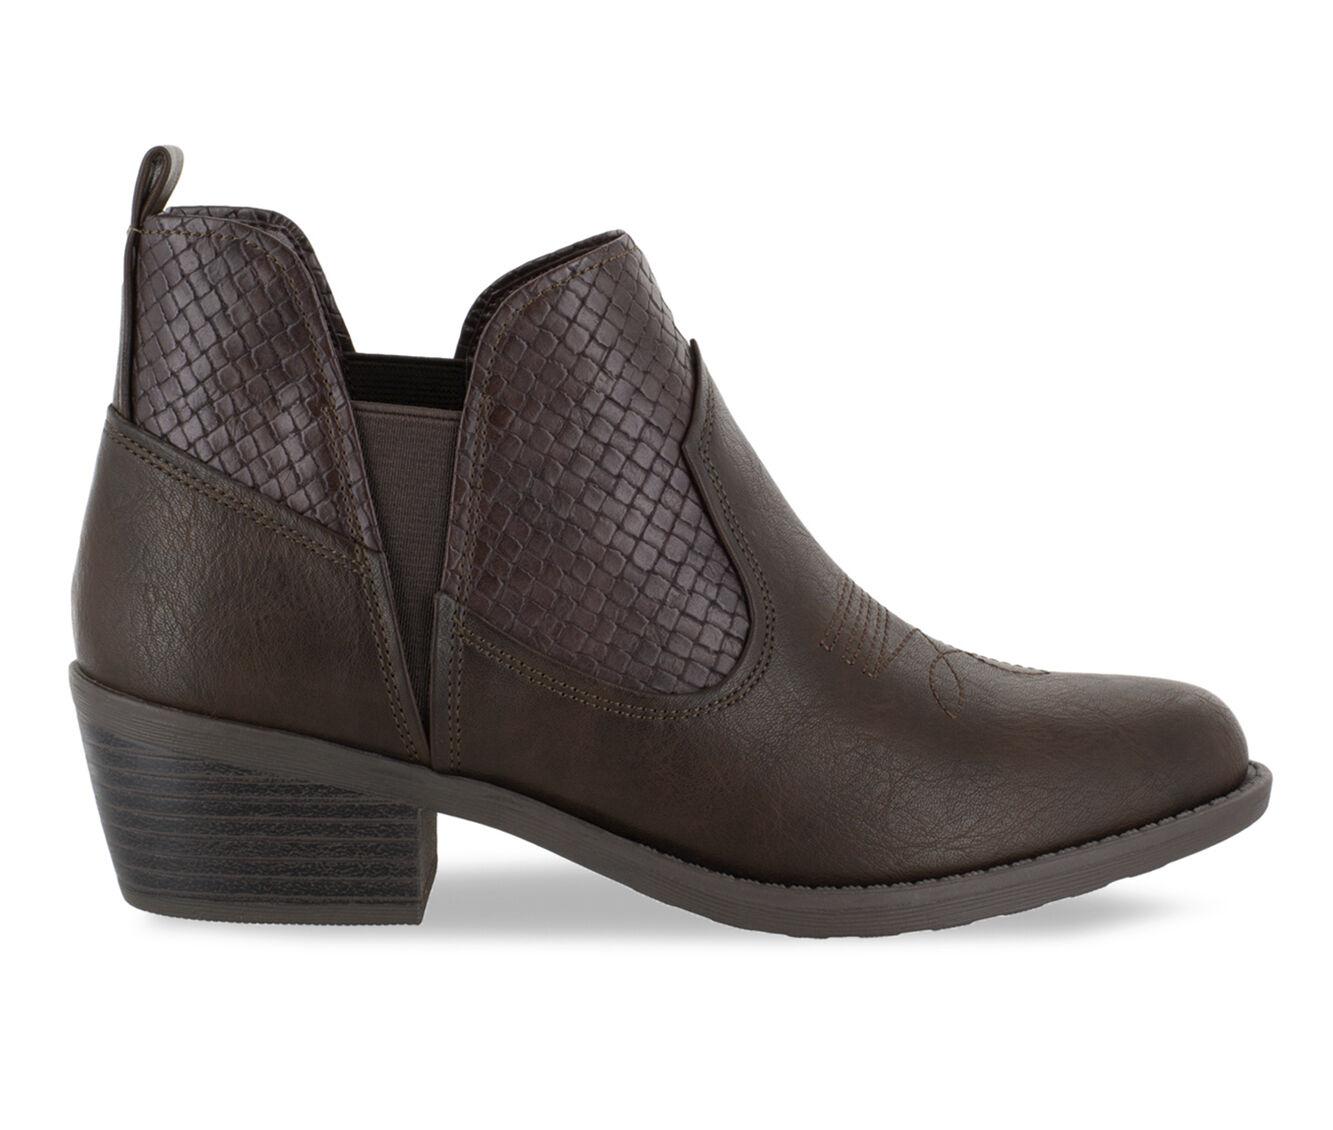 uk shoes_kd5750